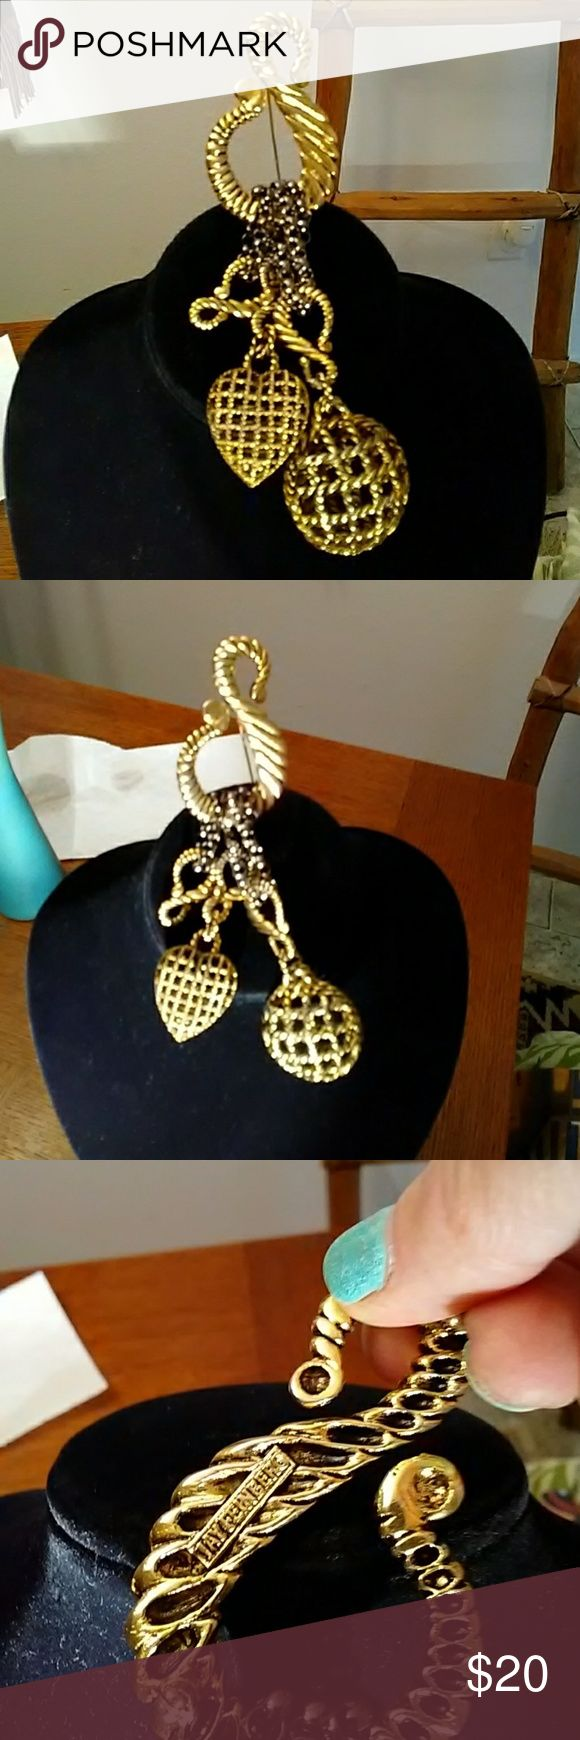 Brooch original Original jay Feinberg gold & black chunky money sign with heart & circular dangles jay feinberg Jewelry Brooches